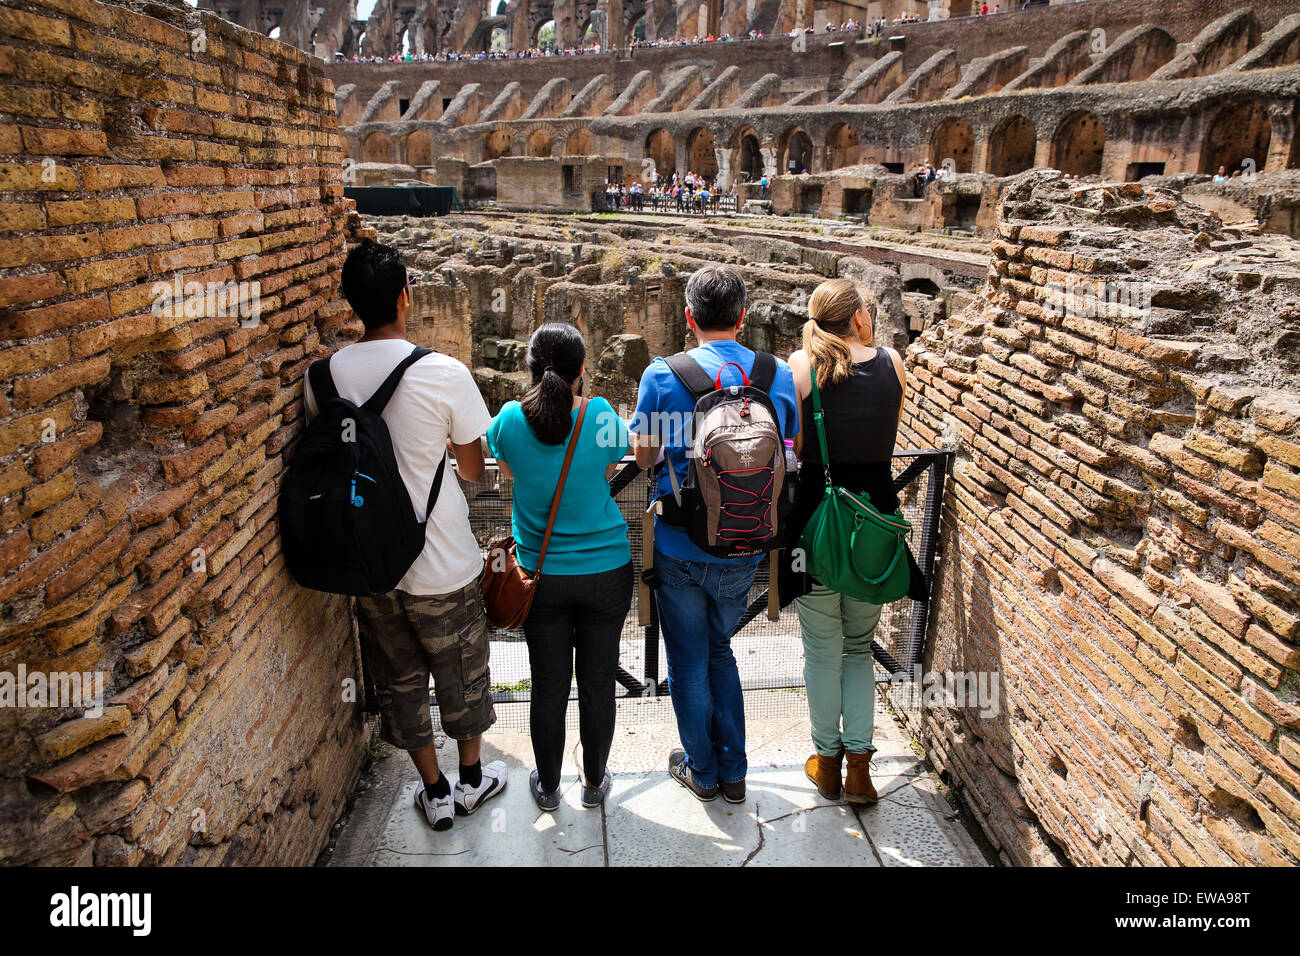 Touristen, die das Kolosseum in Rom zu bewundern Stockbild